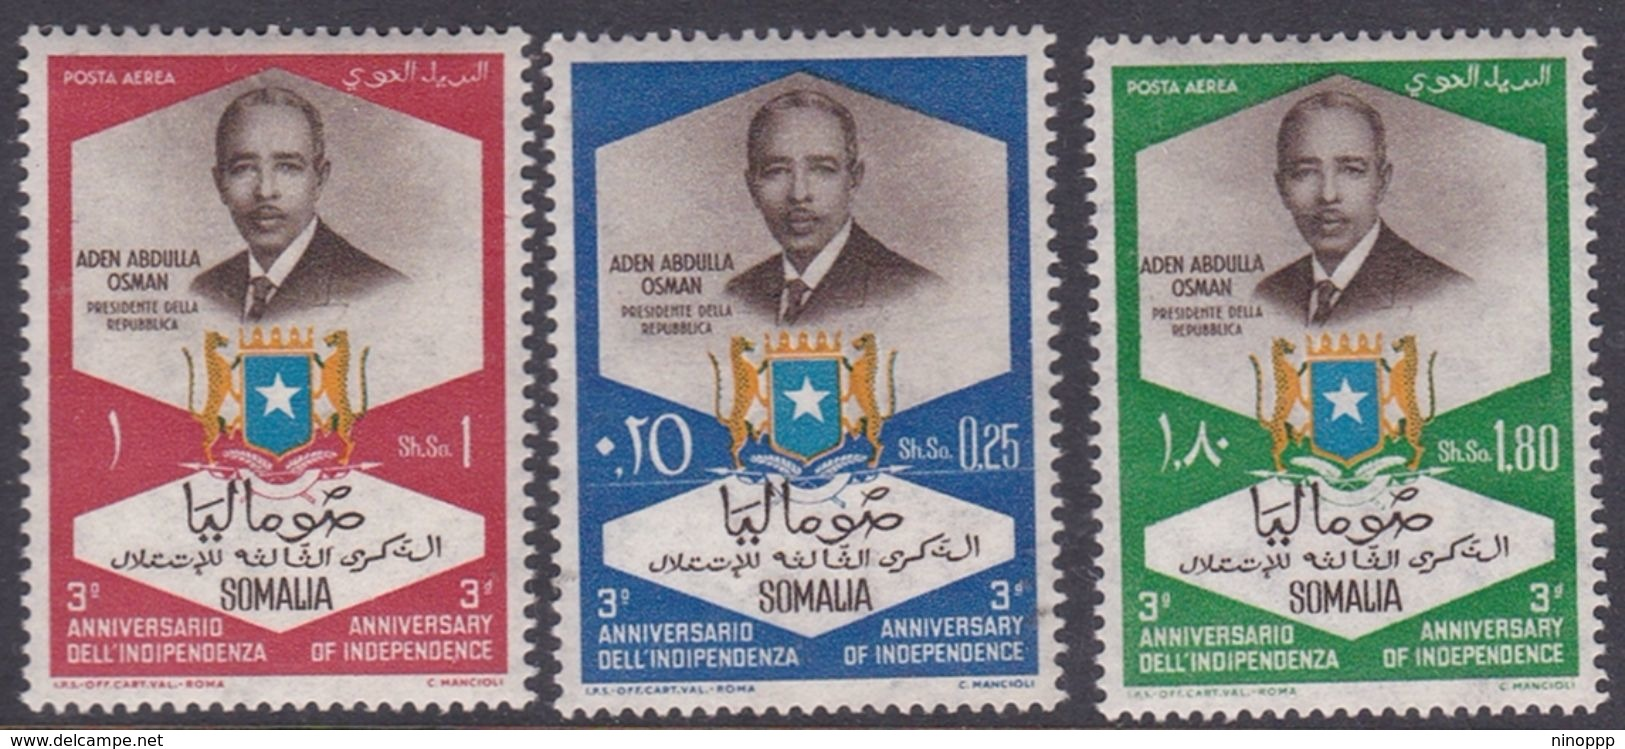 Somalia Scott 270 + C90-91 1963 3rd Anniversary Of Independence, Mint Never Hinged - Somalie (AFIS)